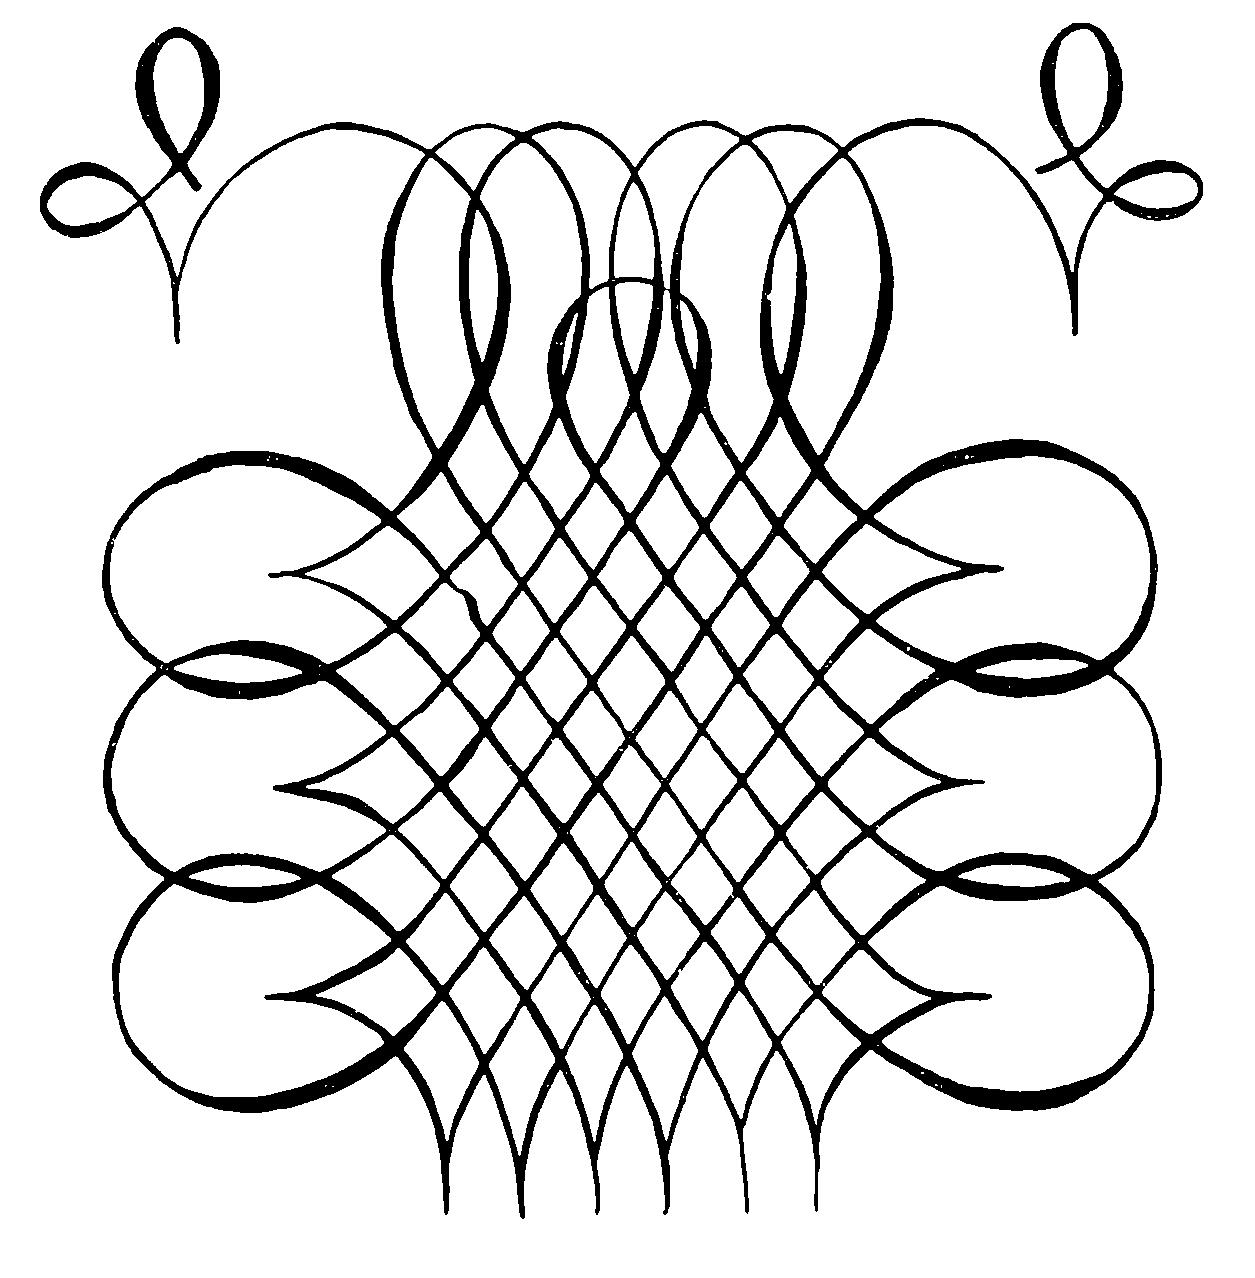 file de re metallica 1912 graph wikimedia mons Rede Globo file de re metallica 1912 graph